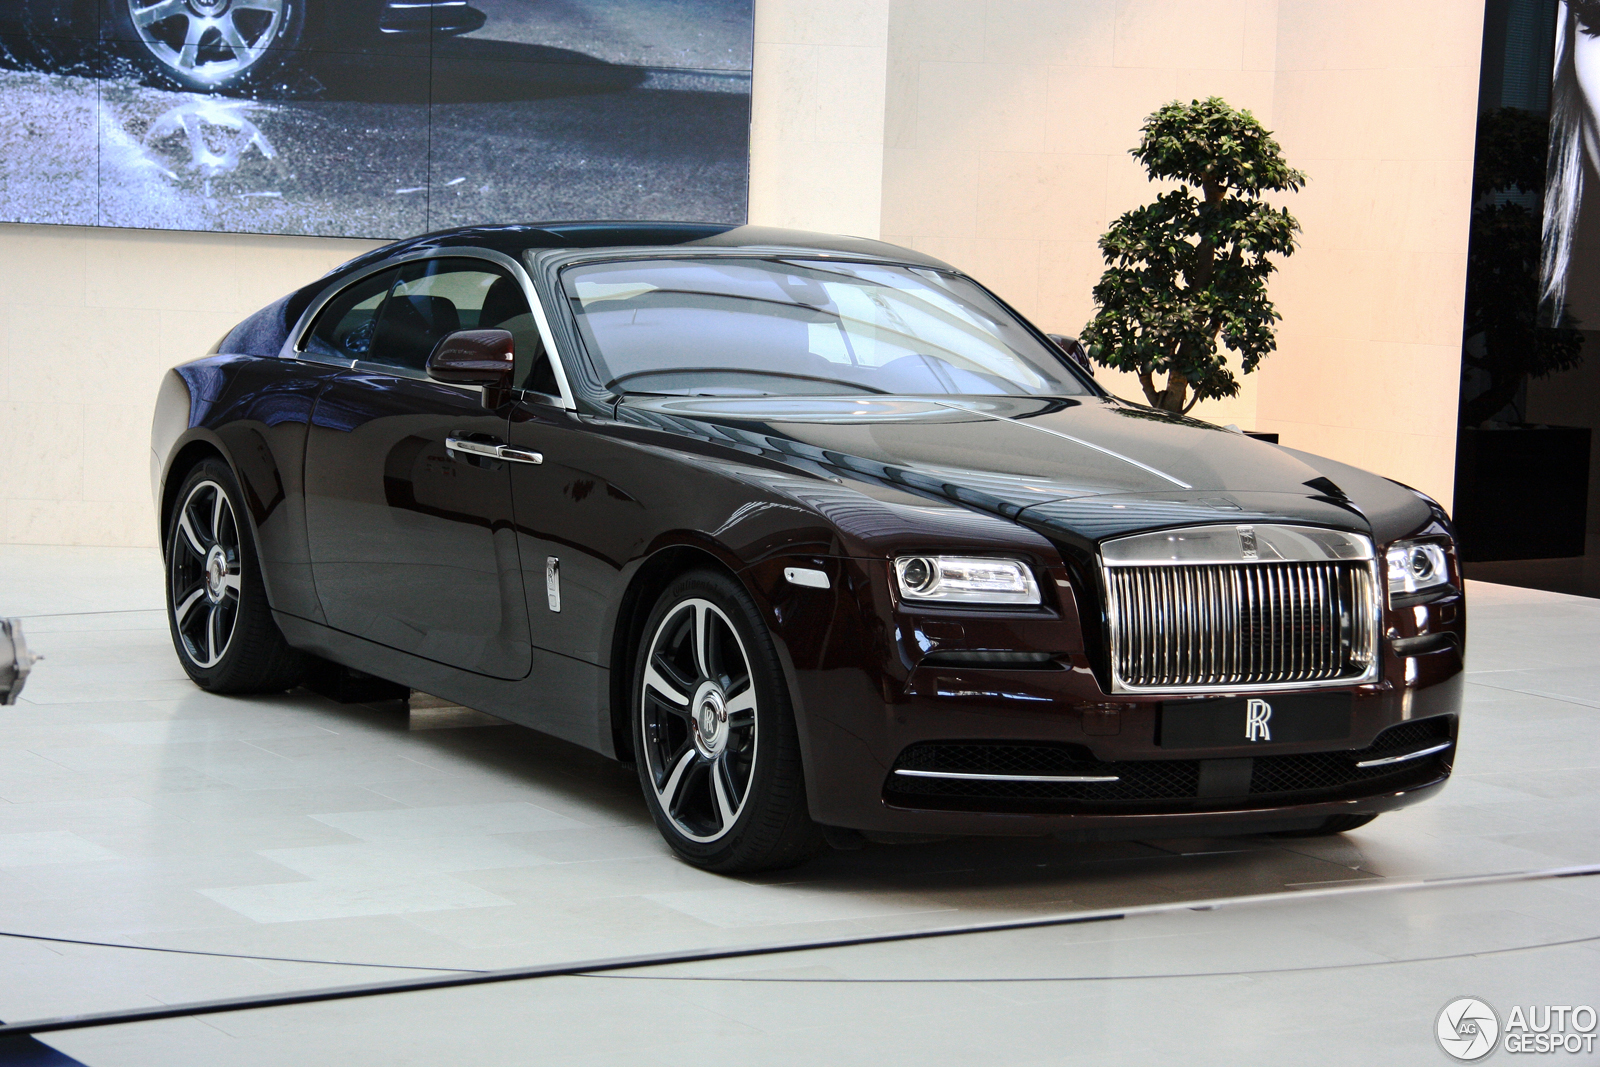 Rolls Royce Wraith Hnnnnnnngggg Pic Bodybuilding Com